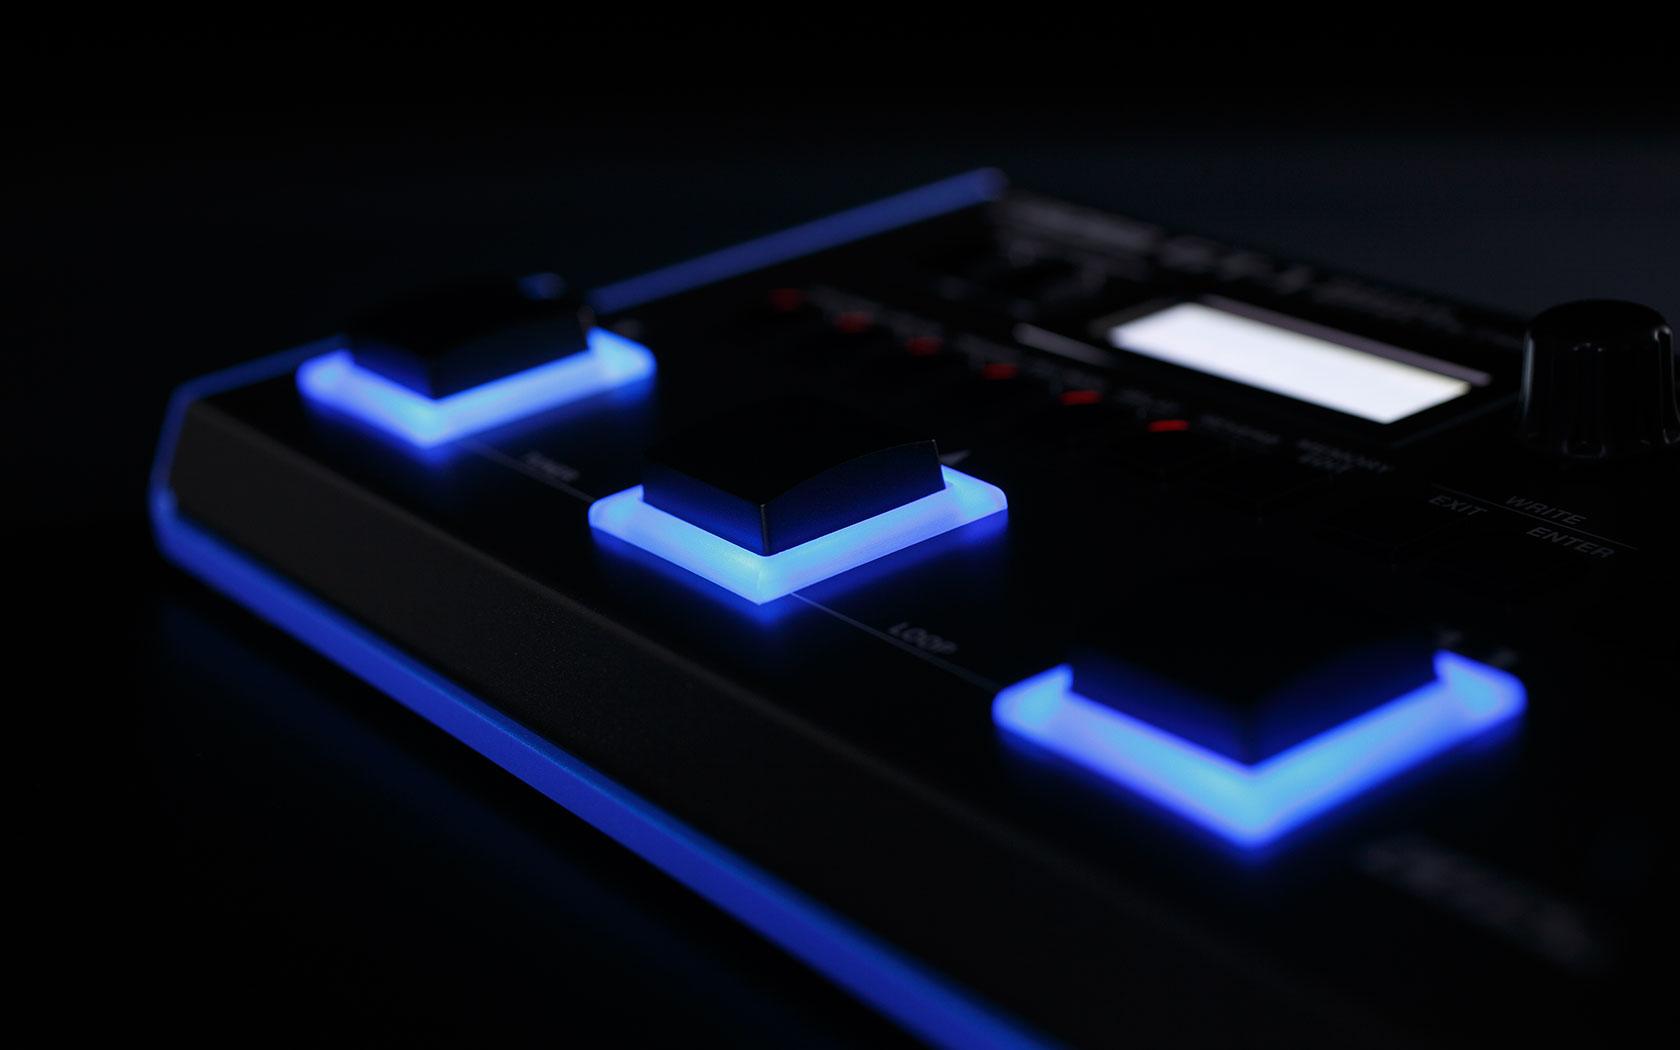 Lichtgevende knoppen boss gt-1 effecten processor pedaal